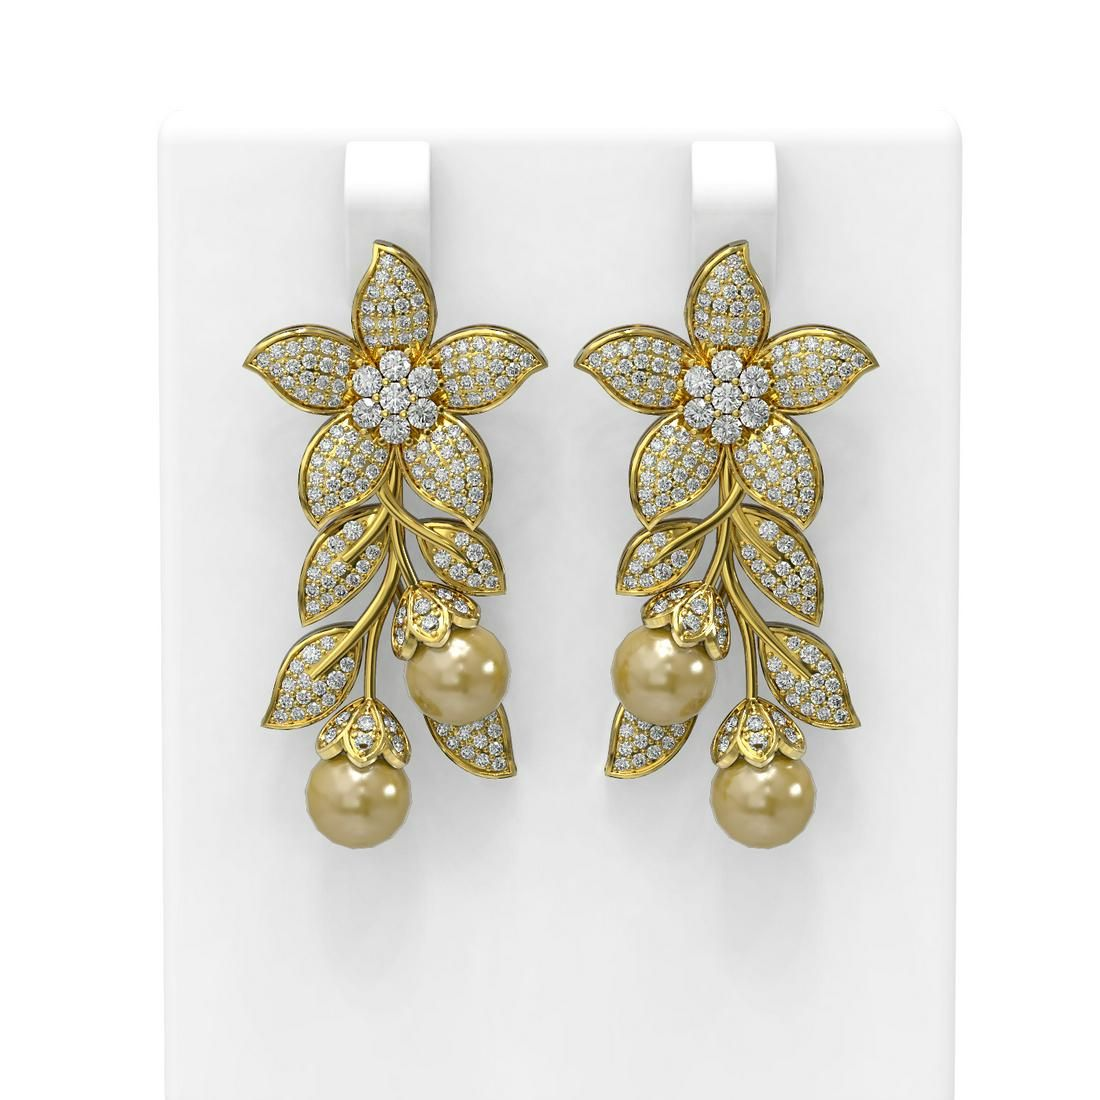 3.05 ctw Diamond & Pearl Earrings 18K Yellow Gold -